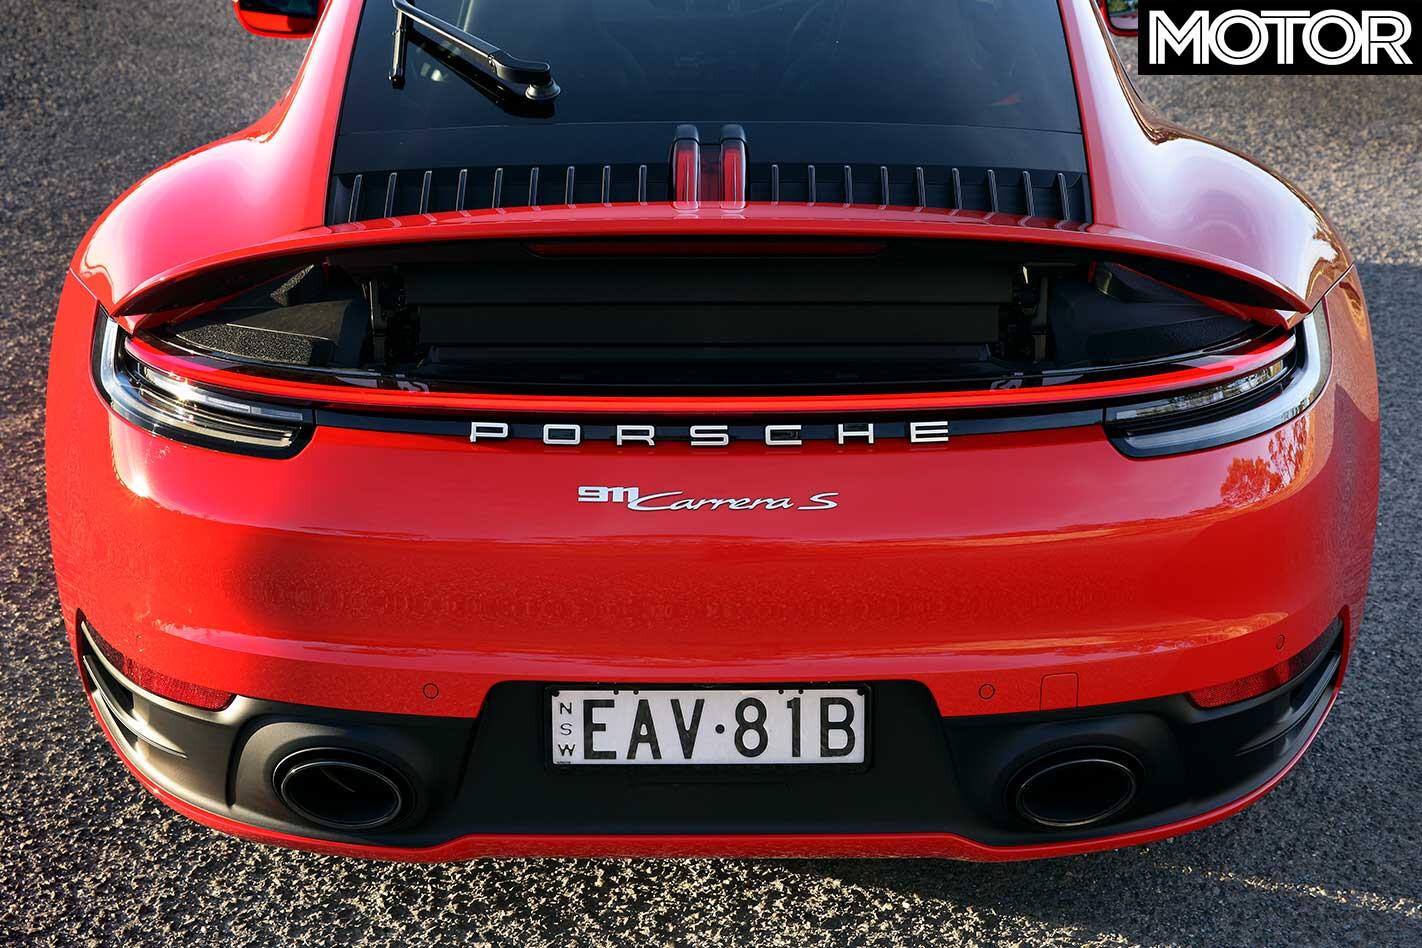 2019 Porsche 911 Carrera S Rear Wing Raised Jpg